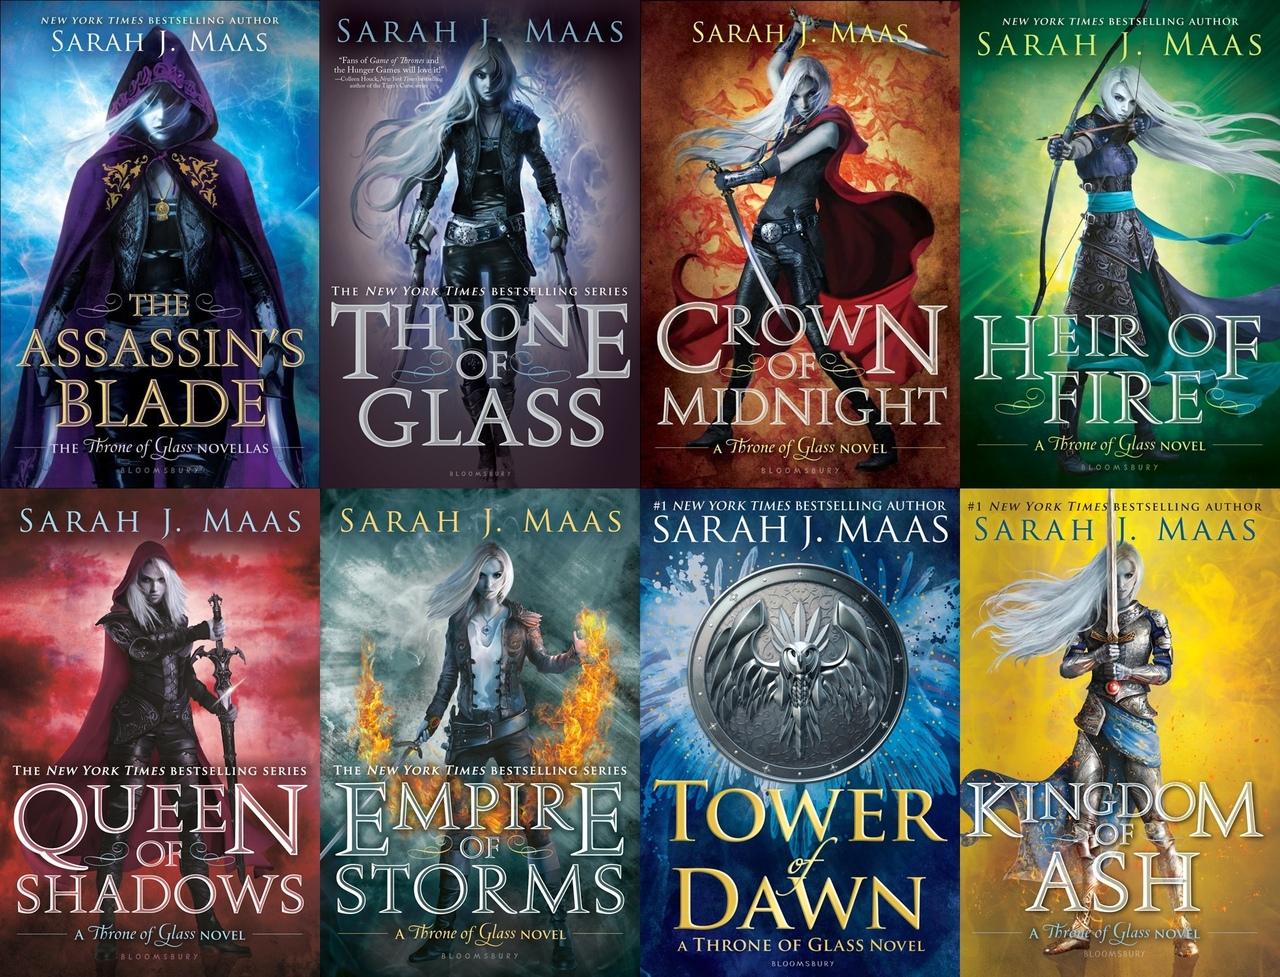 Throne of Glass Series by Sarah J. Maas